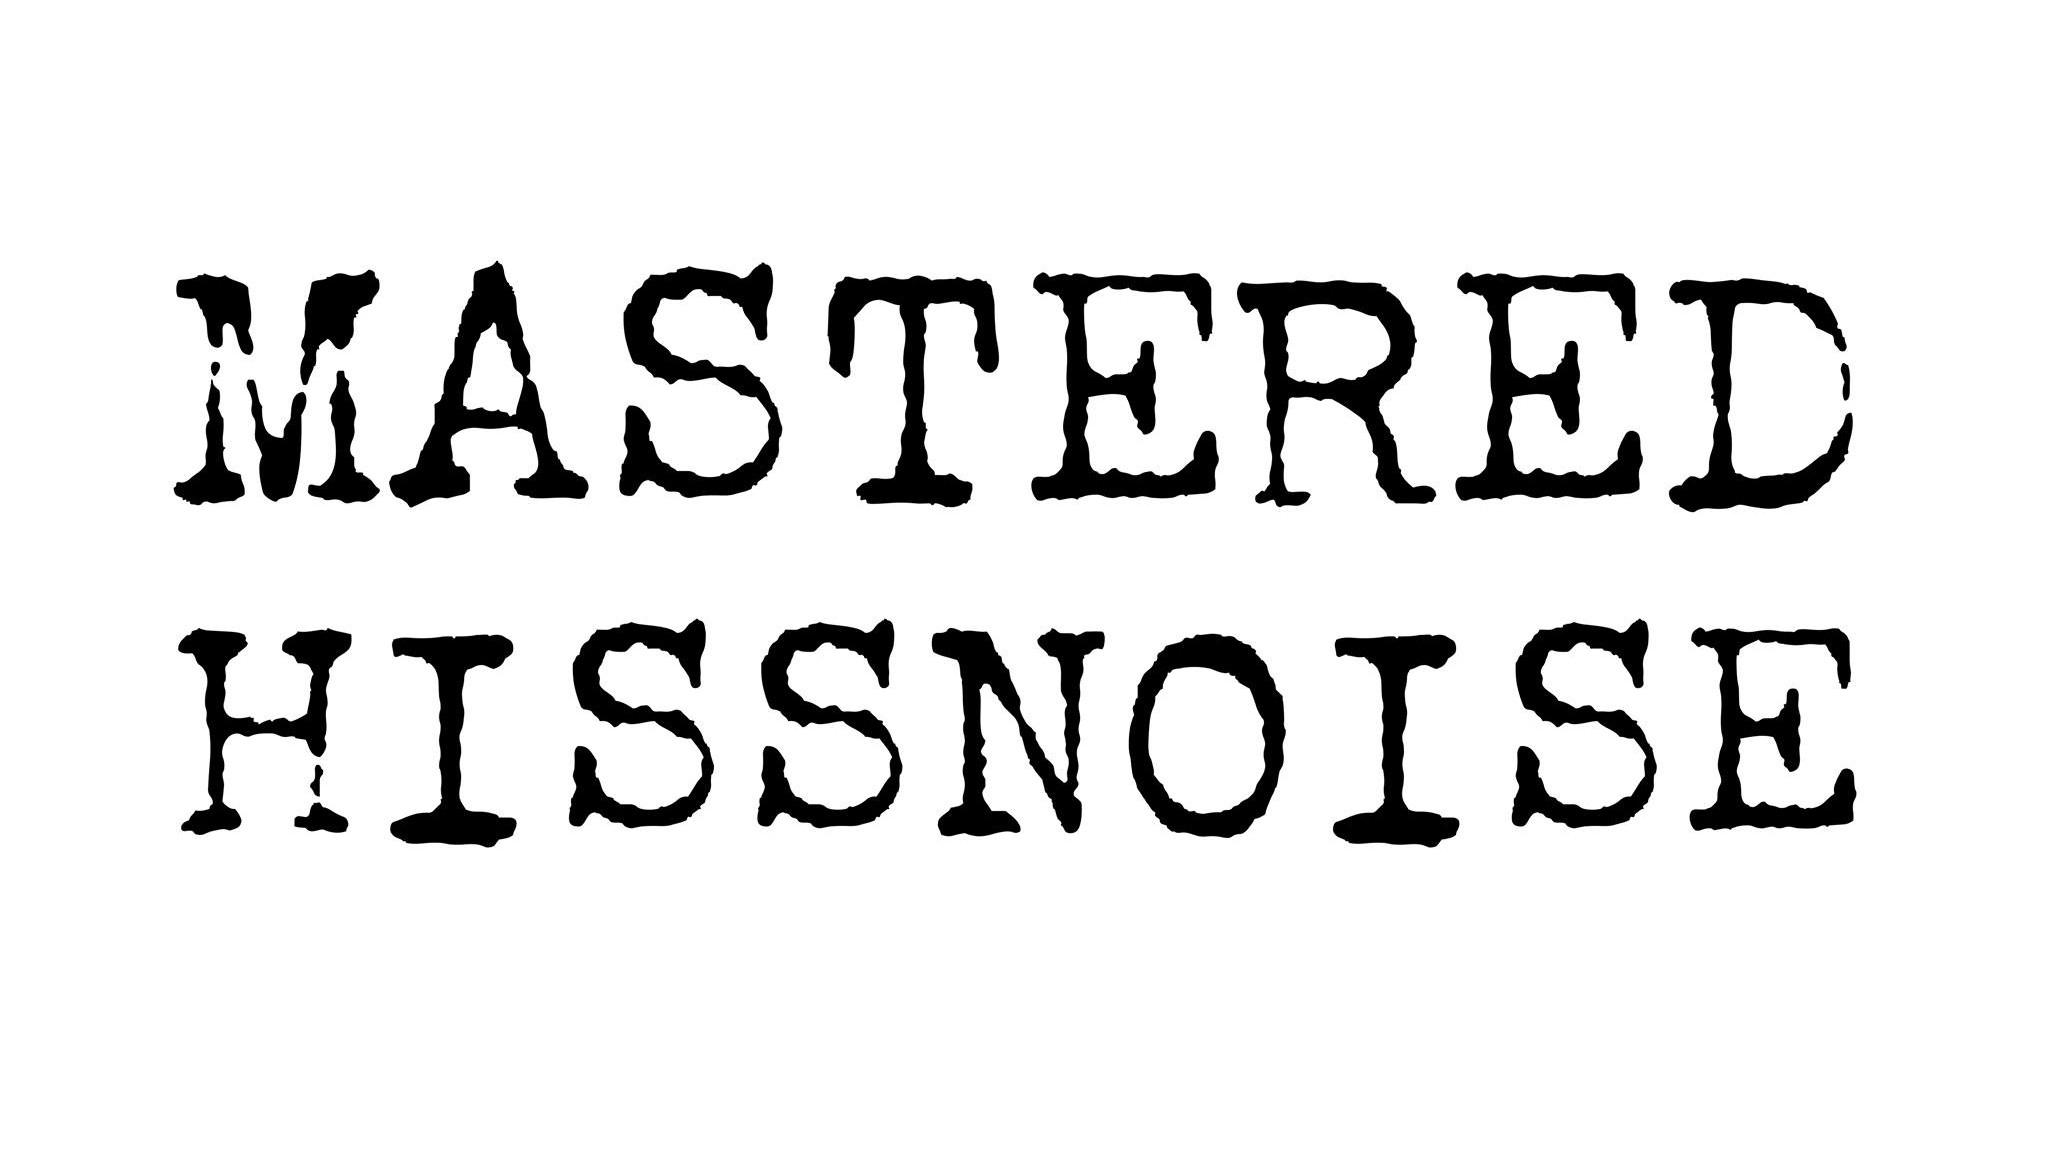 「MASTERED HISSNOISE」の画像検索結果